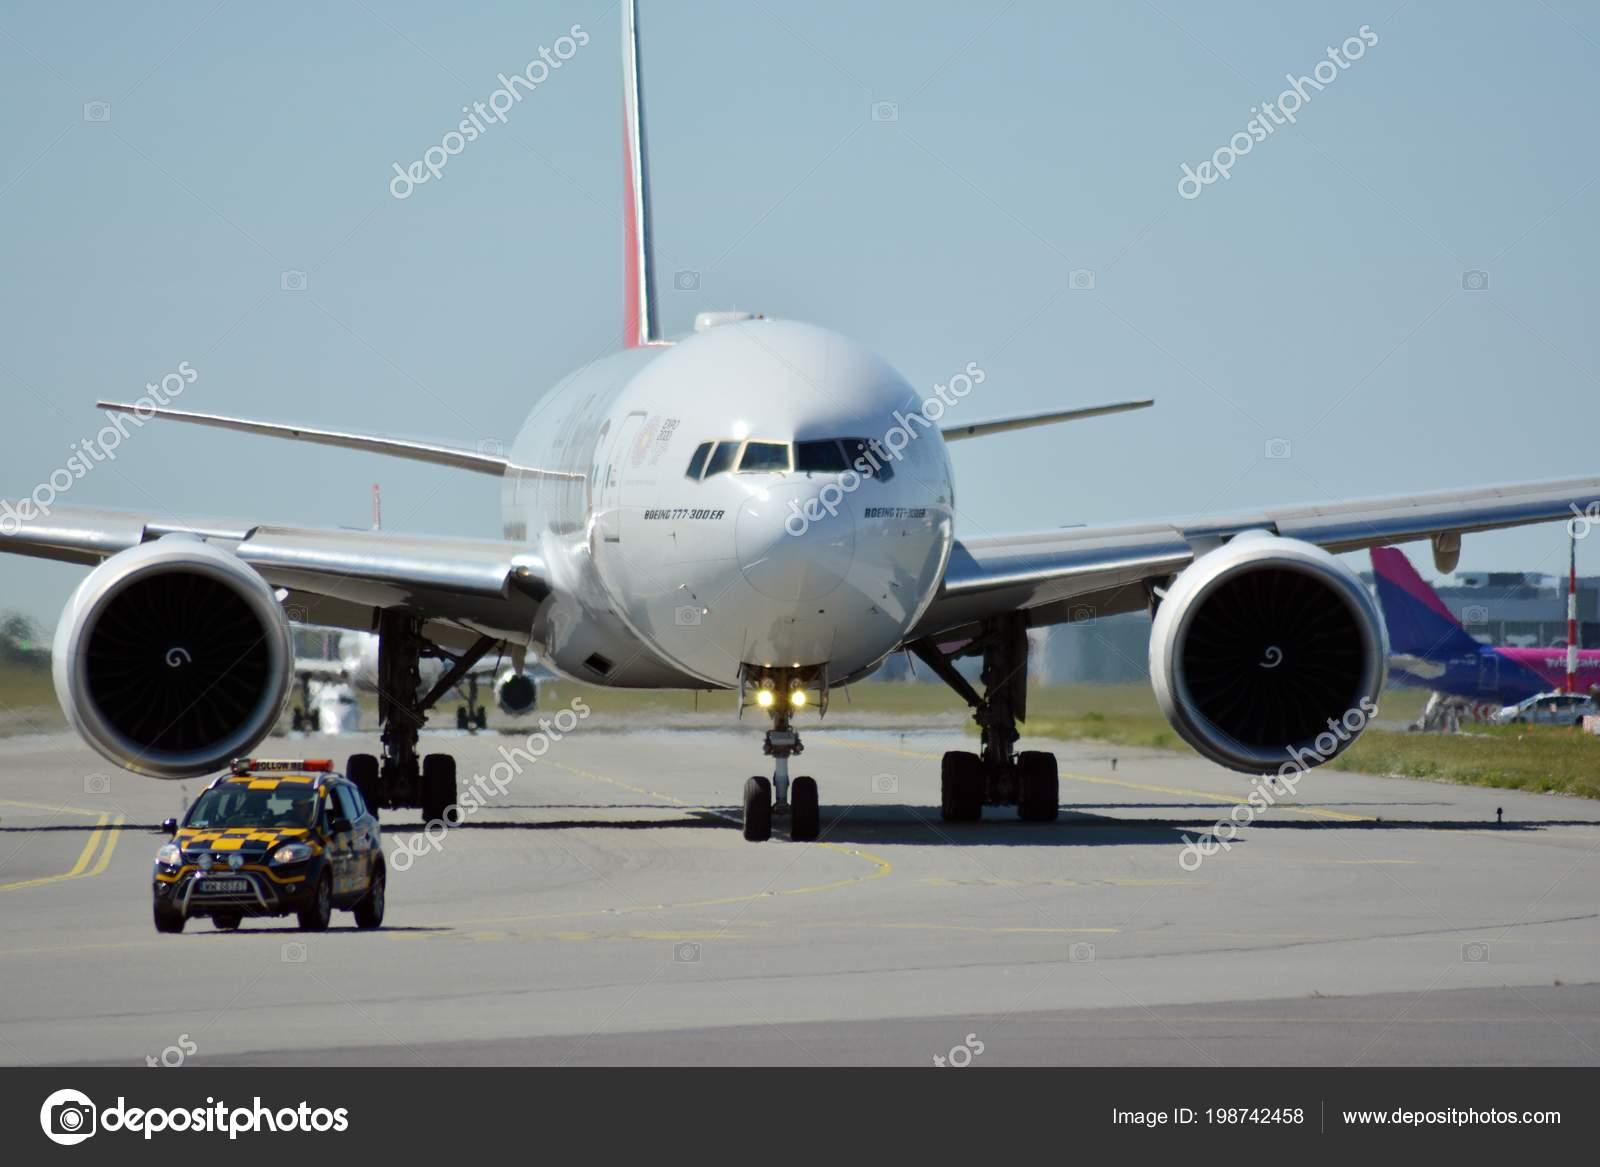 Warsaw Poland June 2018 Plane Epj Boeing 777 31H Emirates